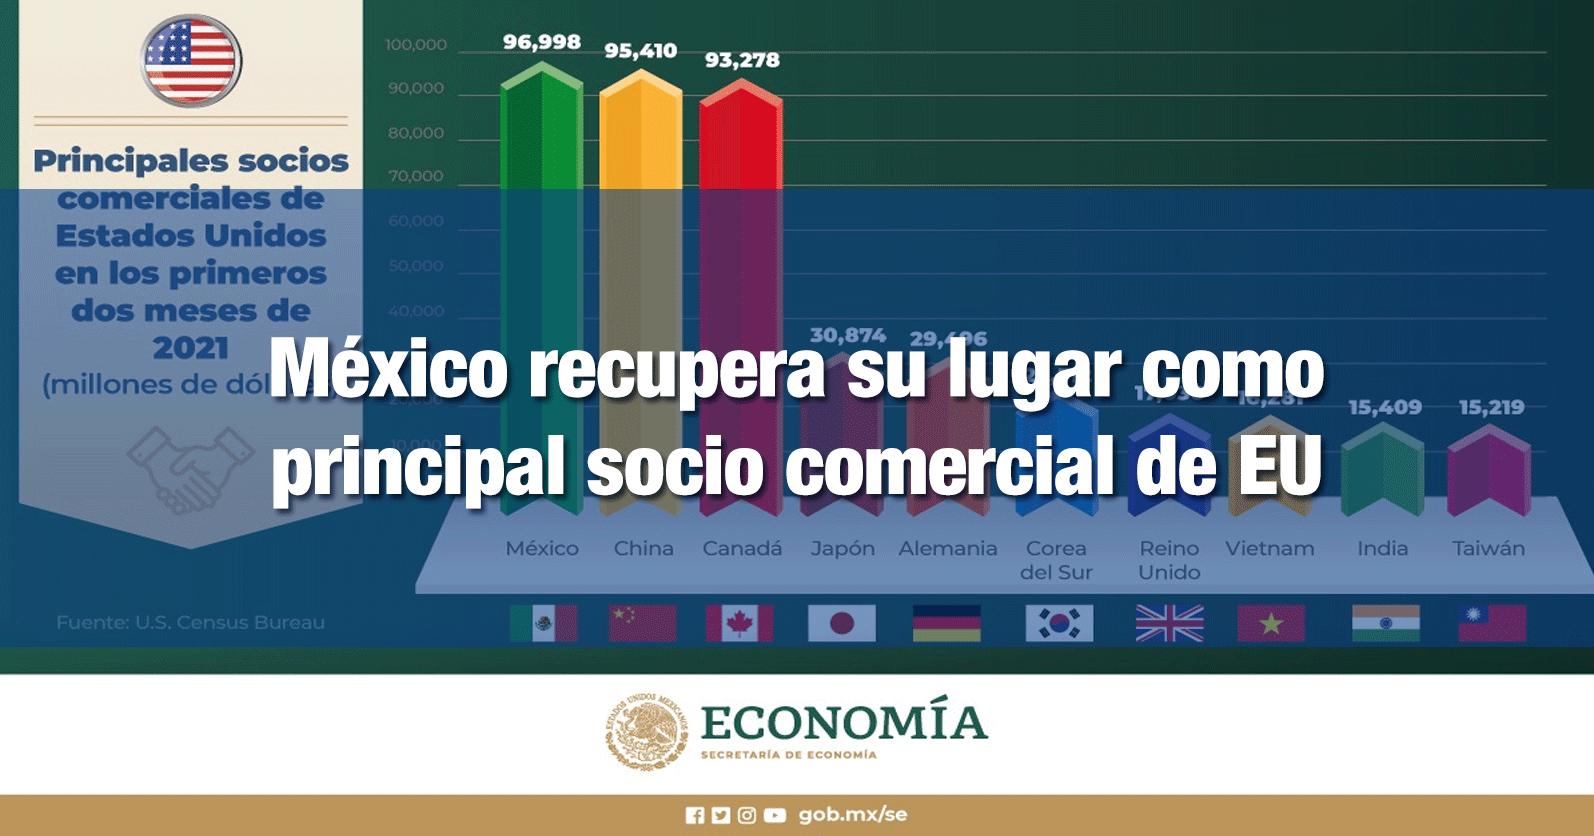 México recupera su lugar como principal socio comercial de EU